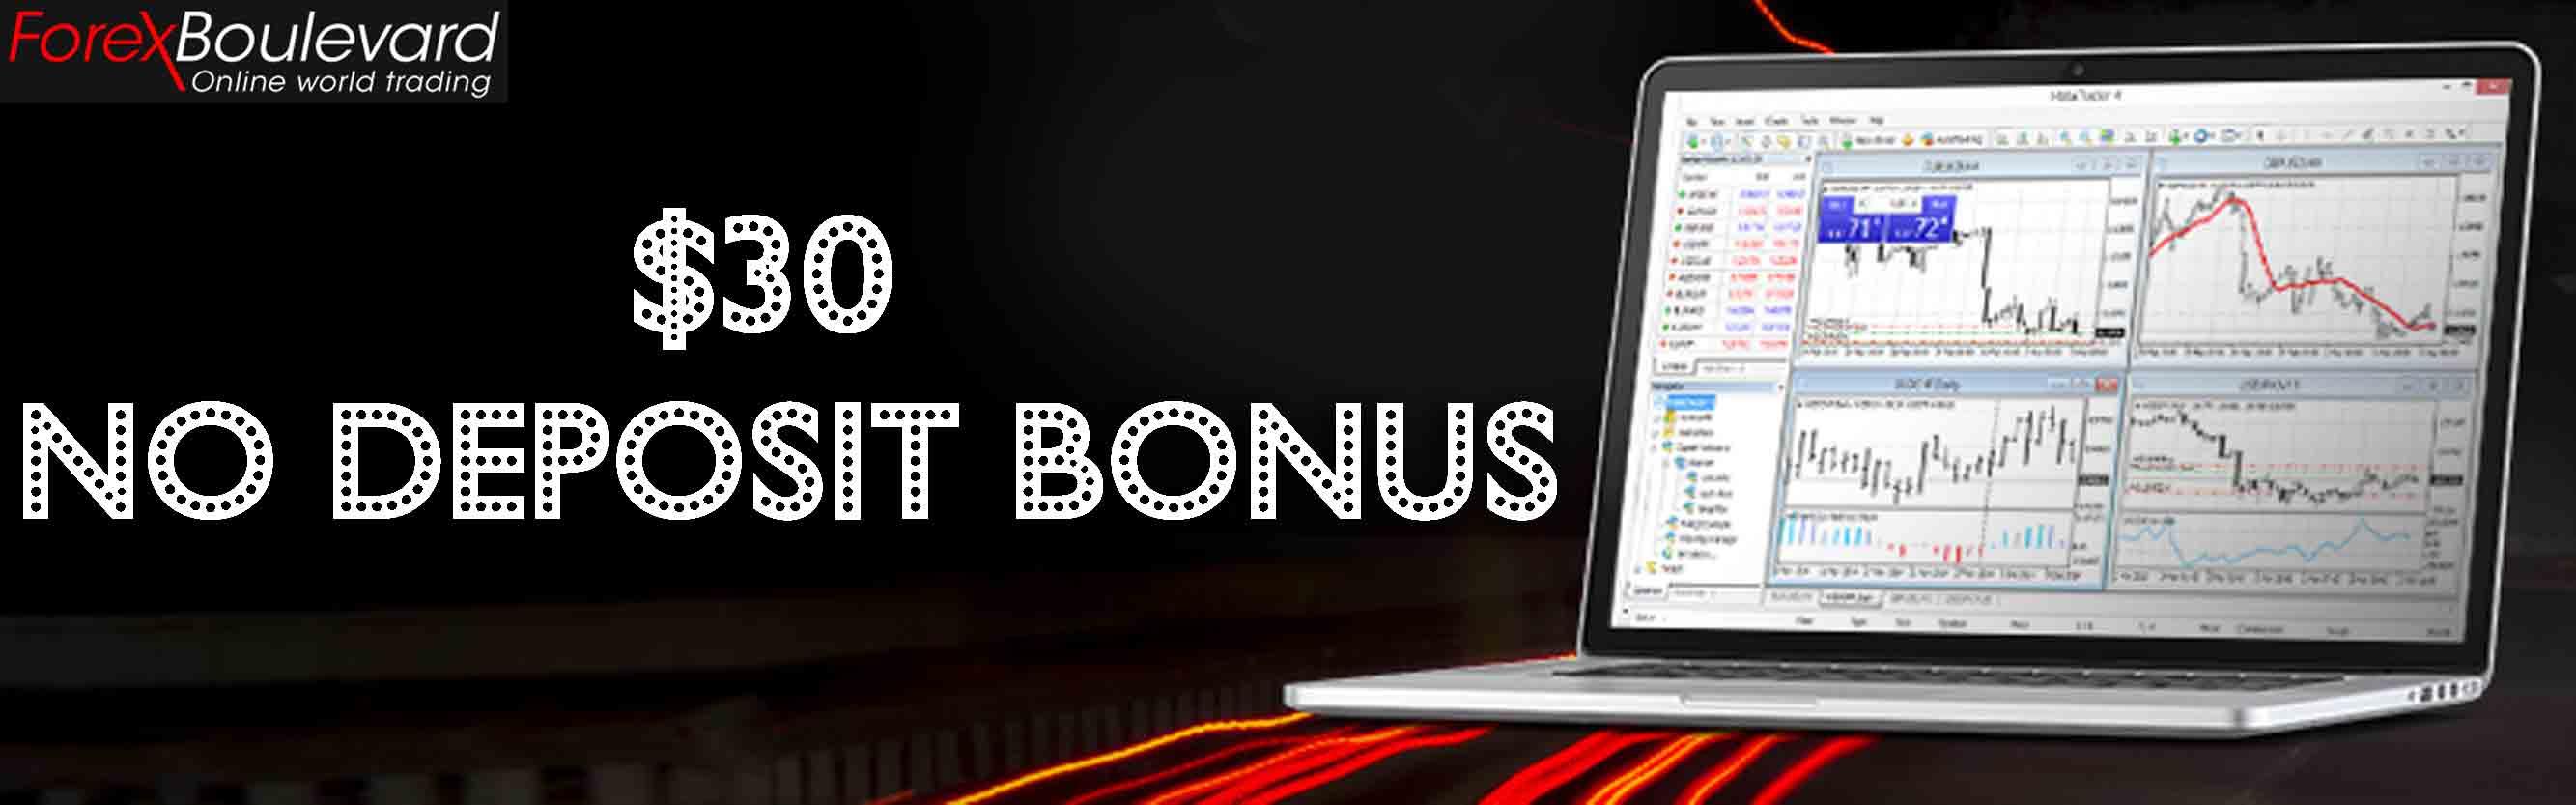 forexblvd no deposit bonus